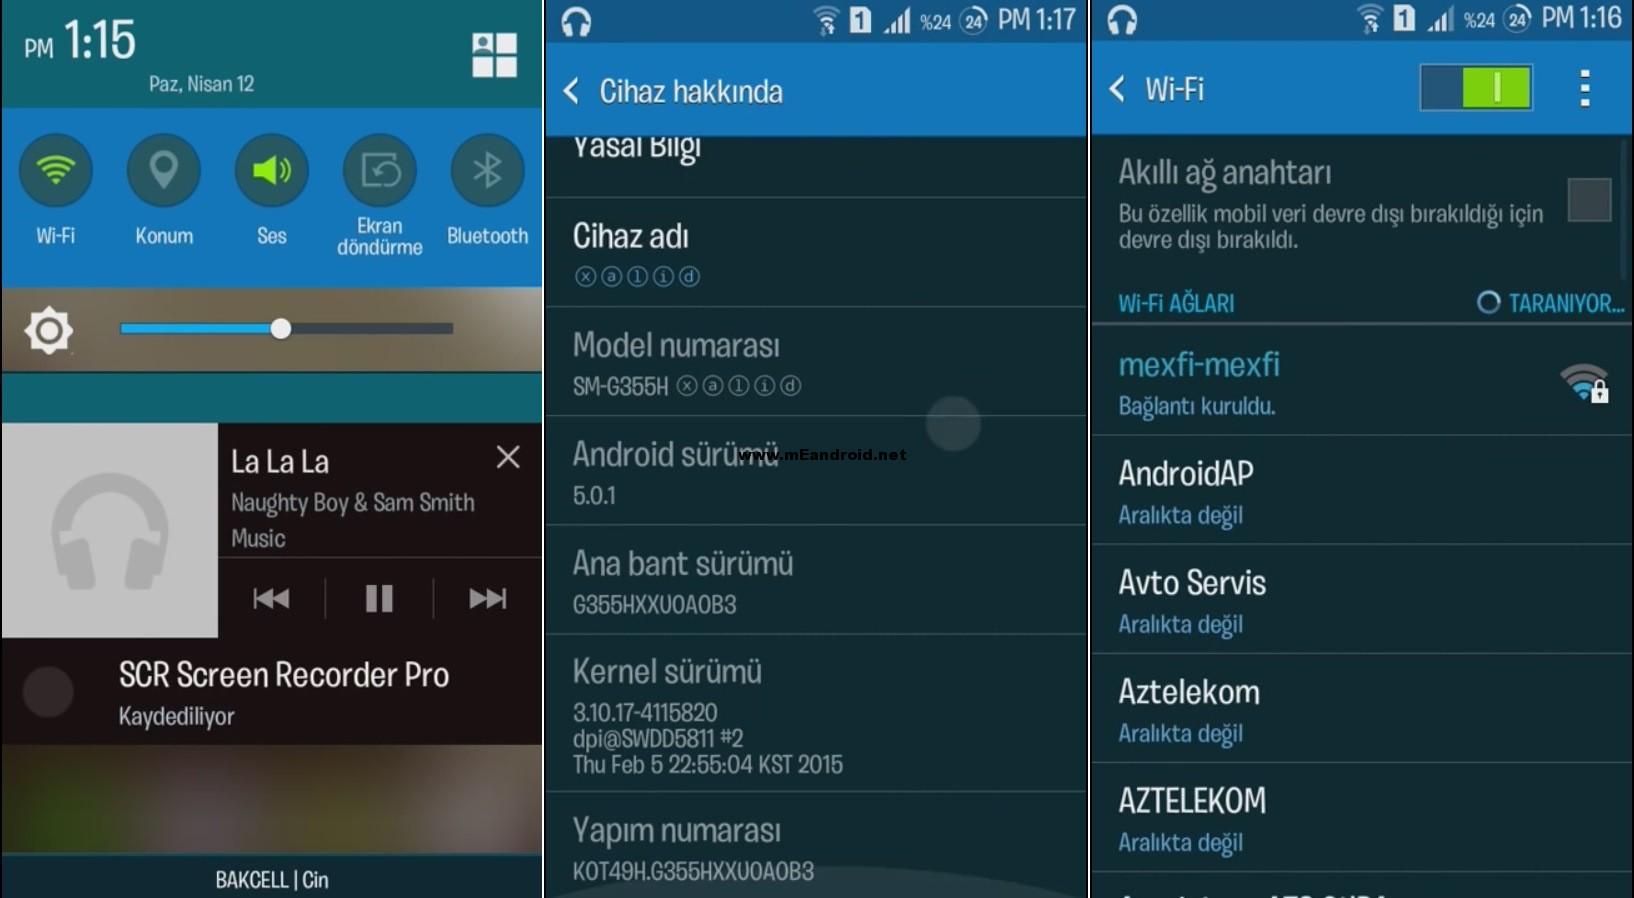 روم اندرويد 5 لولي بوب لهاتف Galaxy Core 2 SM-G355H